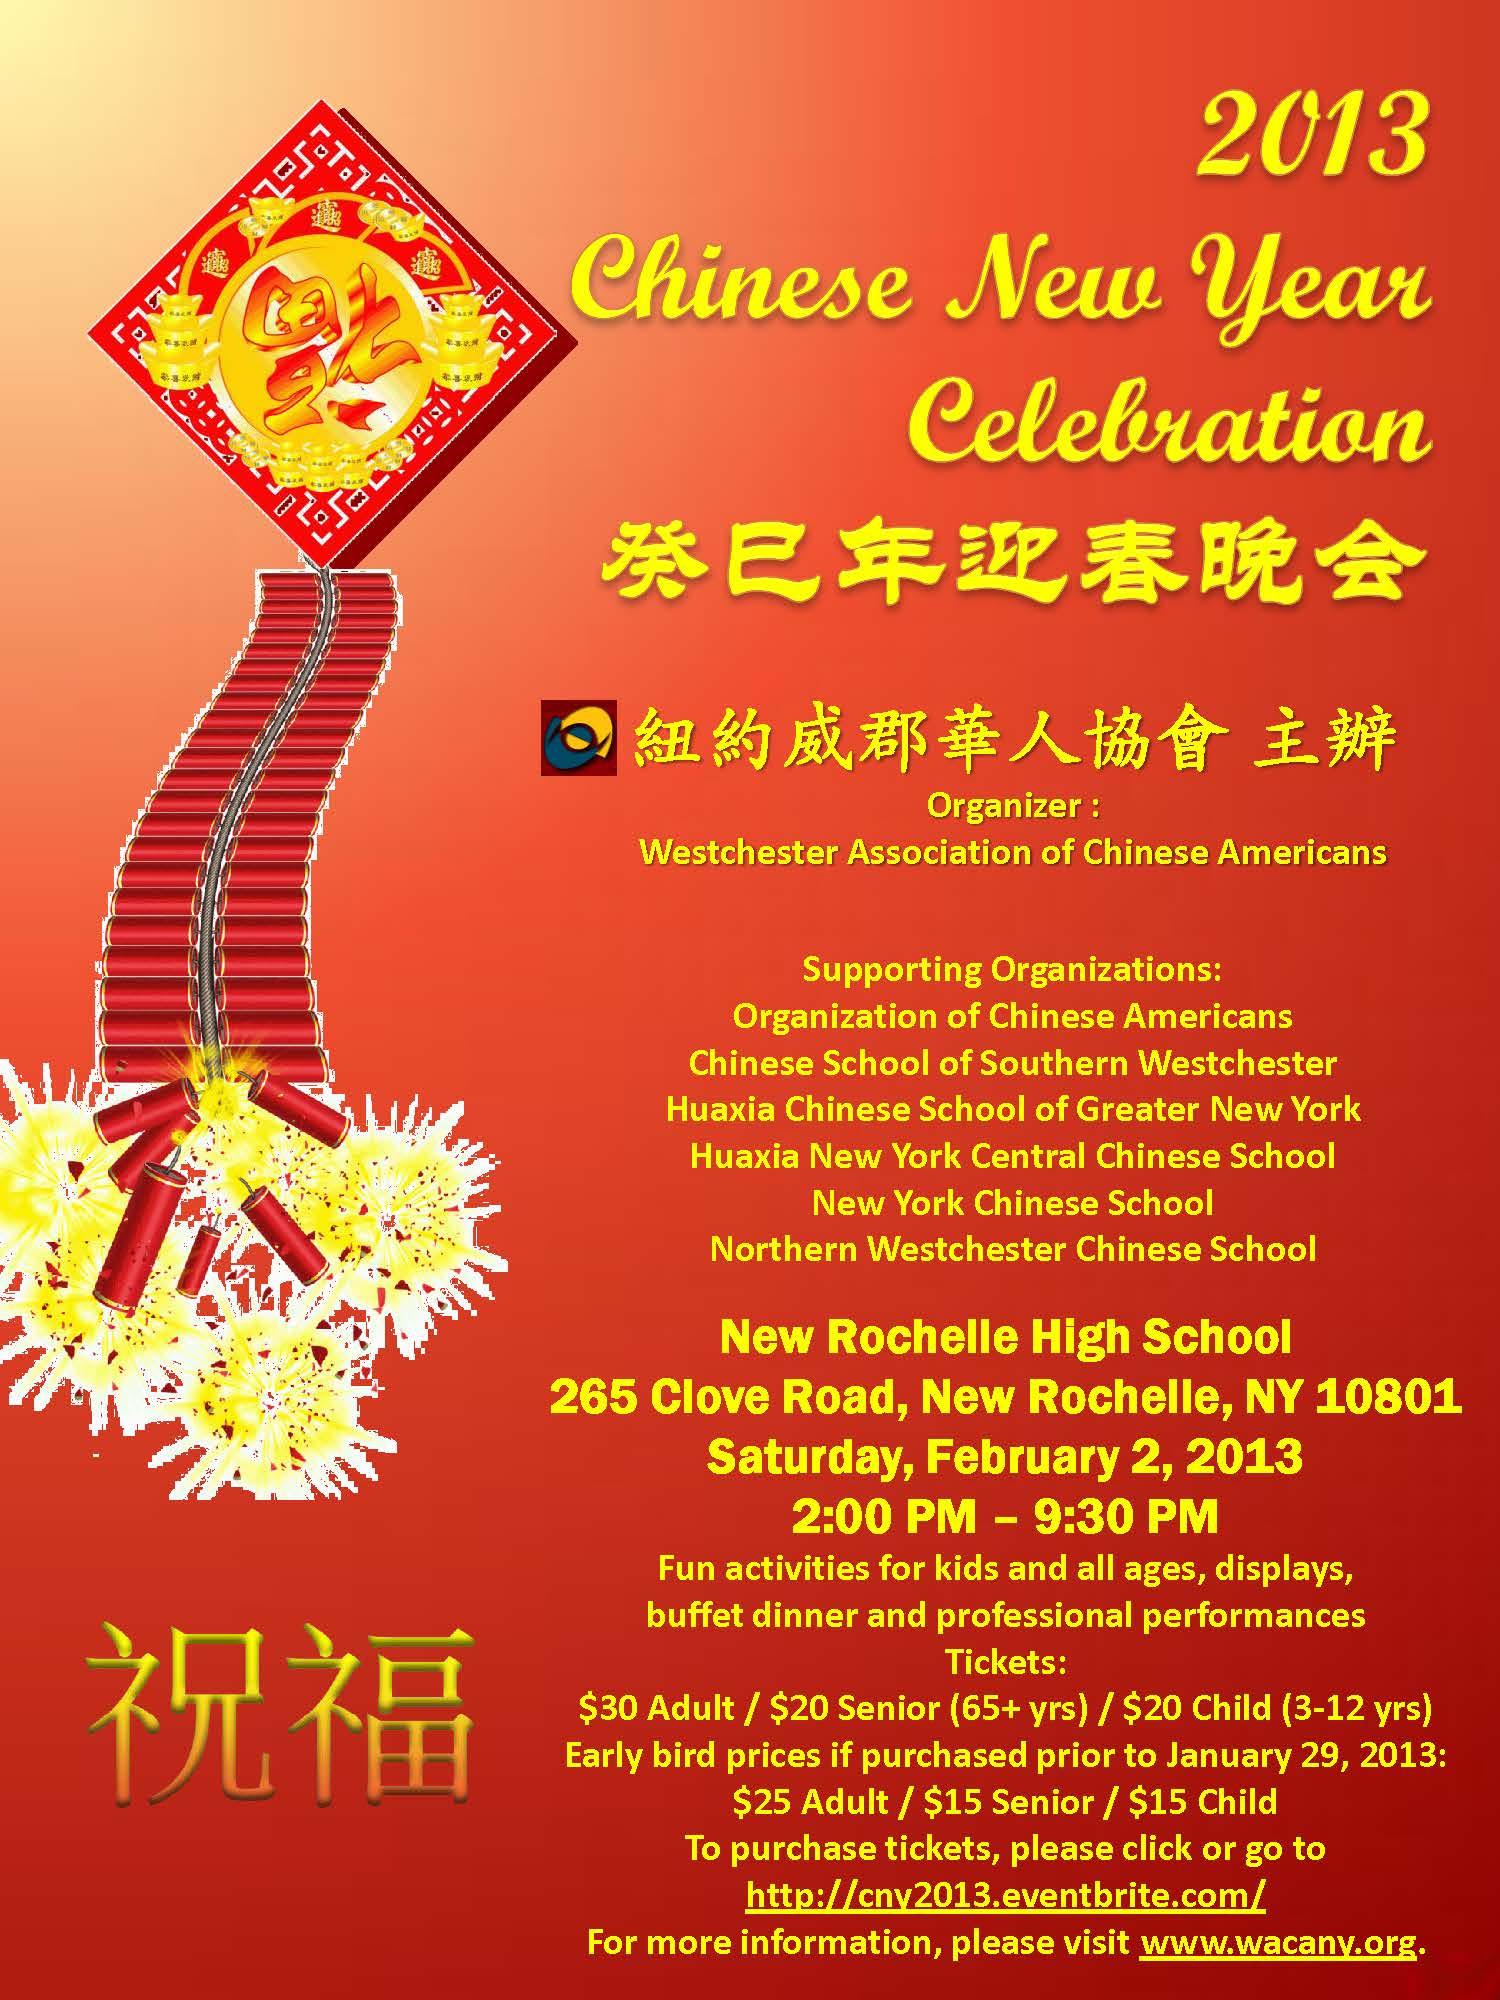 2013 Chinese New Year Celebration Flyer[1].jpg